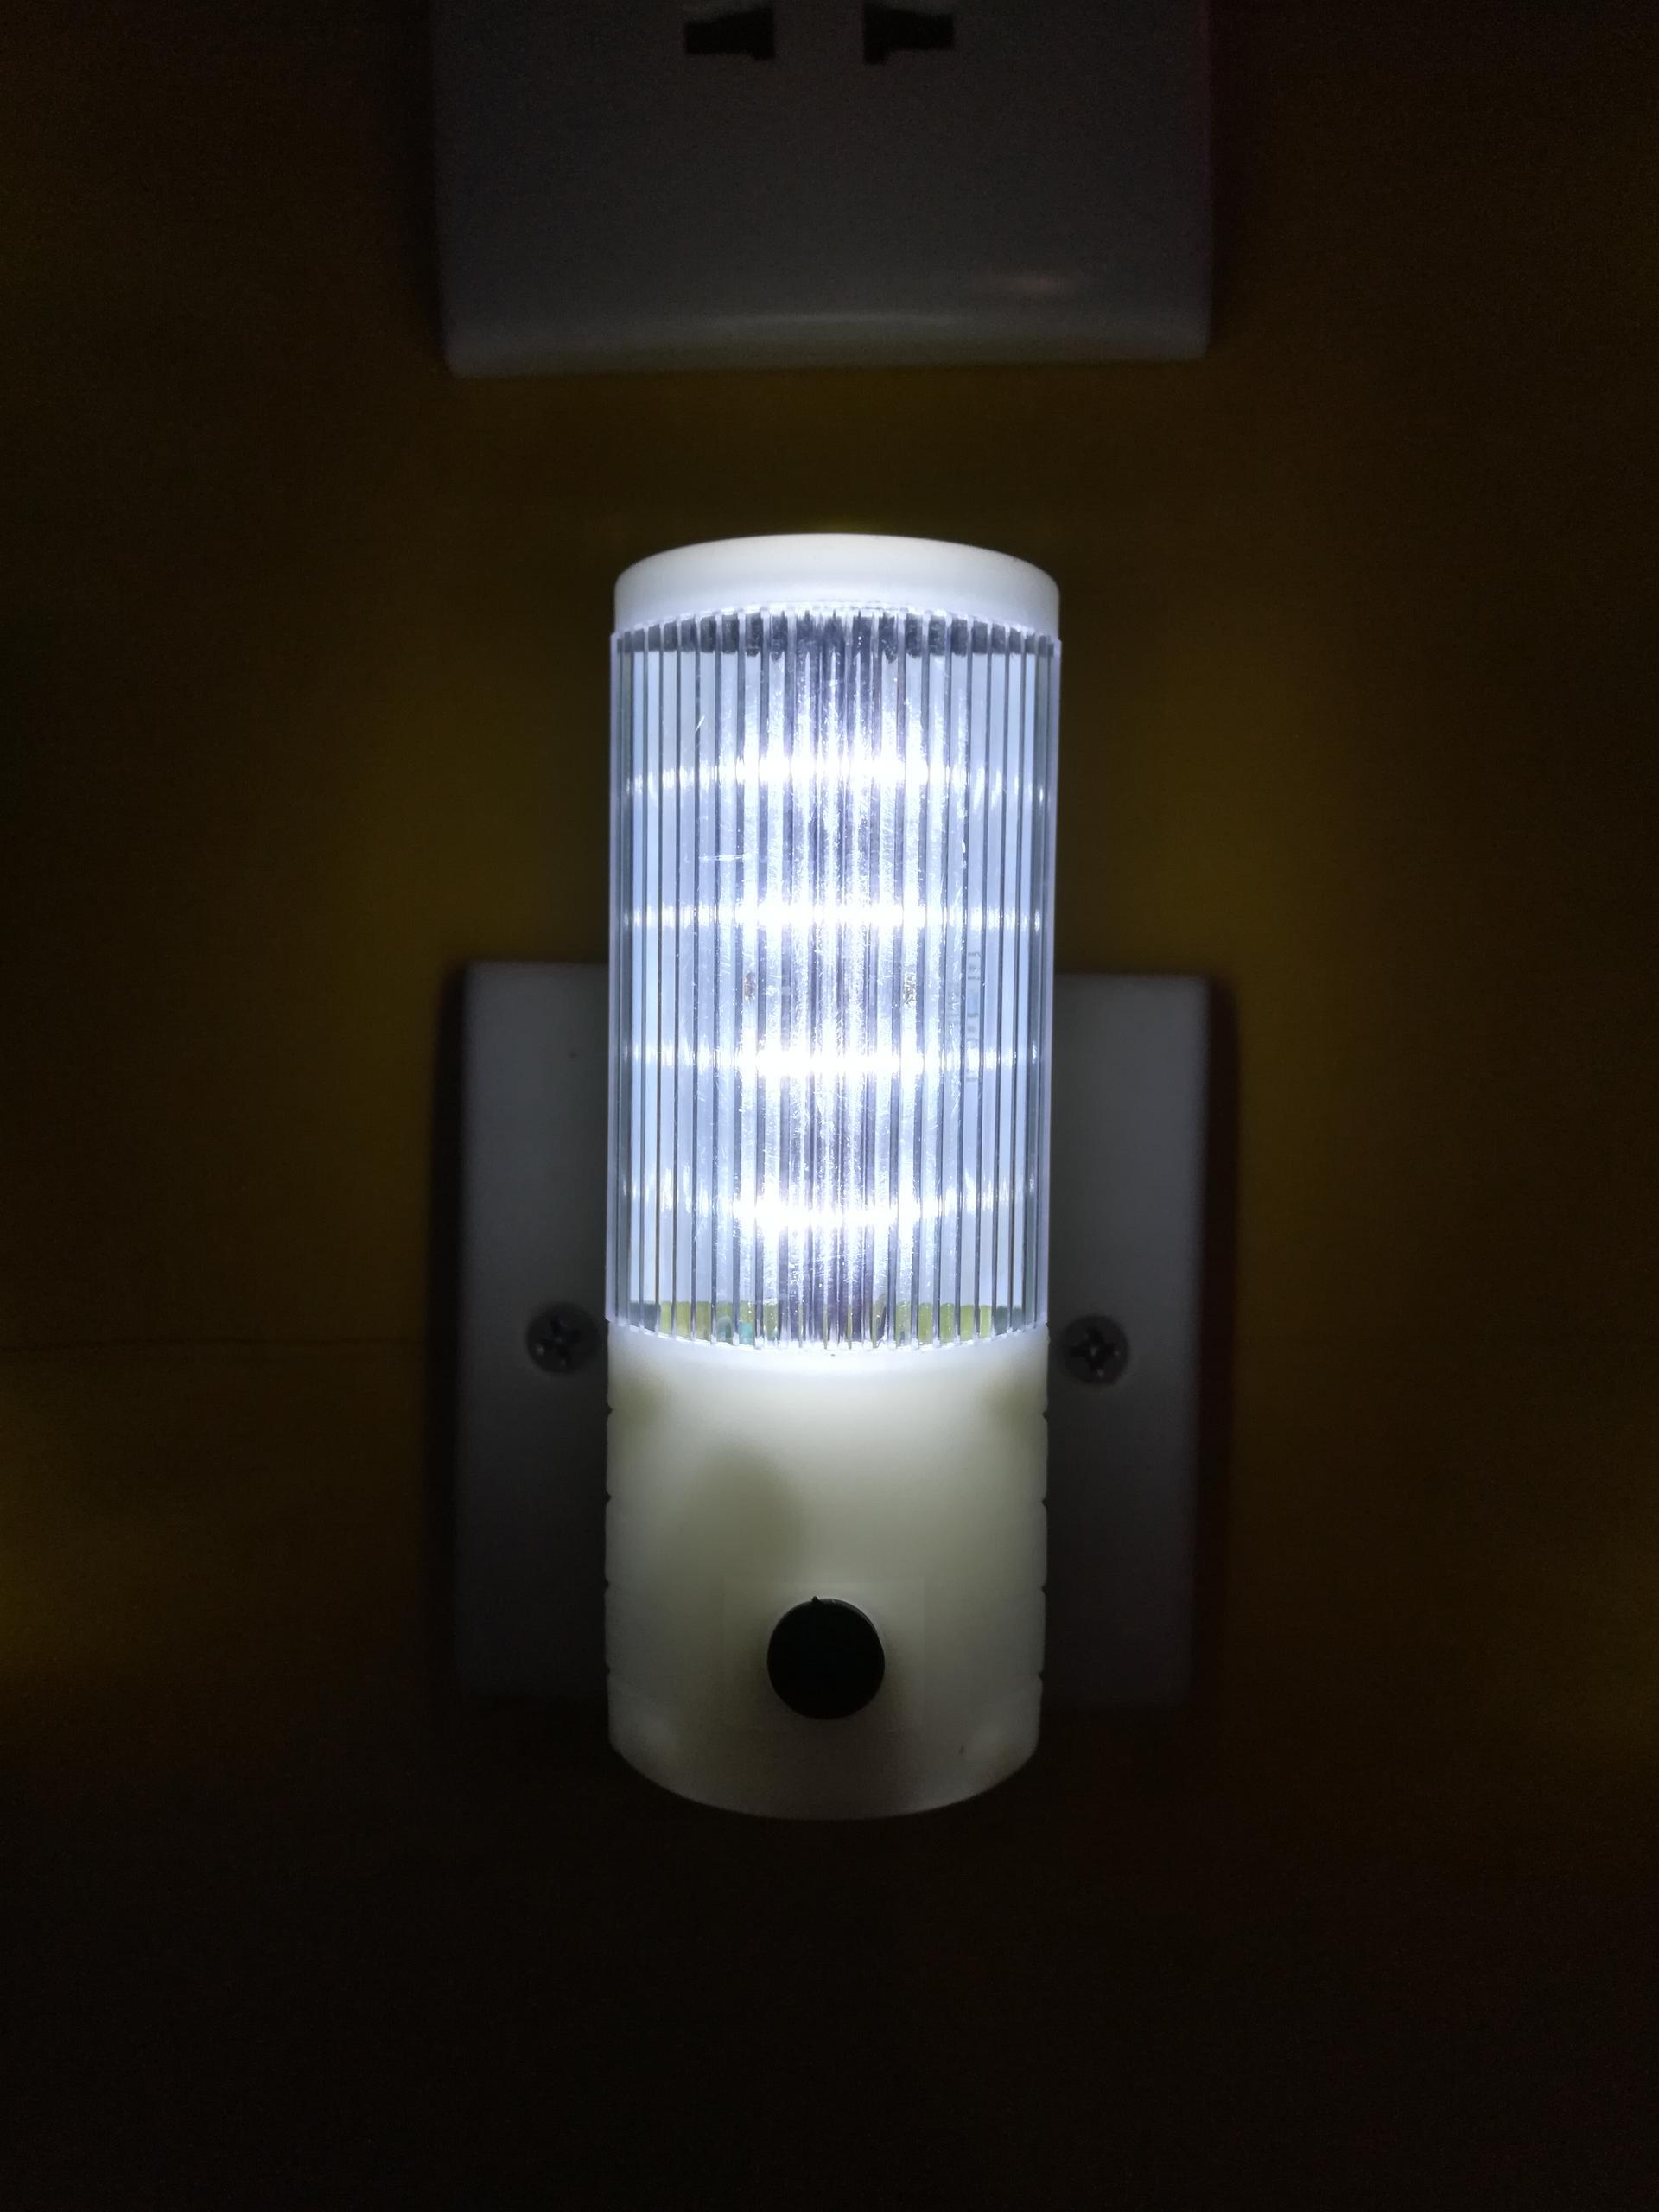 A106 OEM mini sensor control plug in ABS material nightlight lamp for bedroom